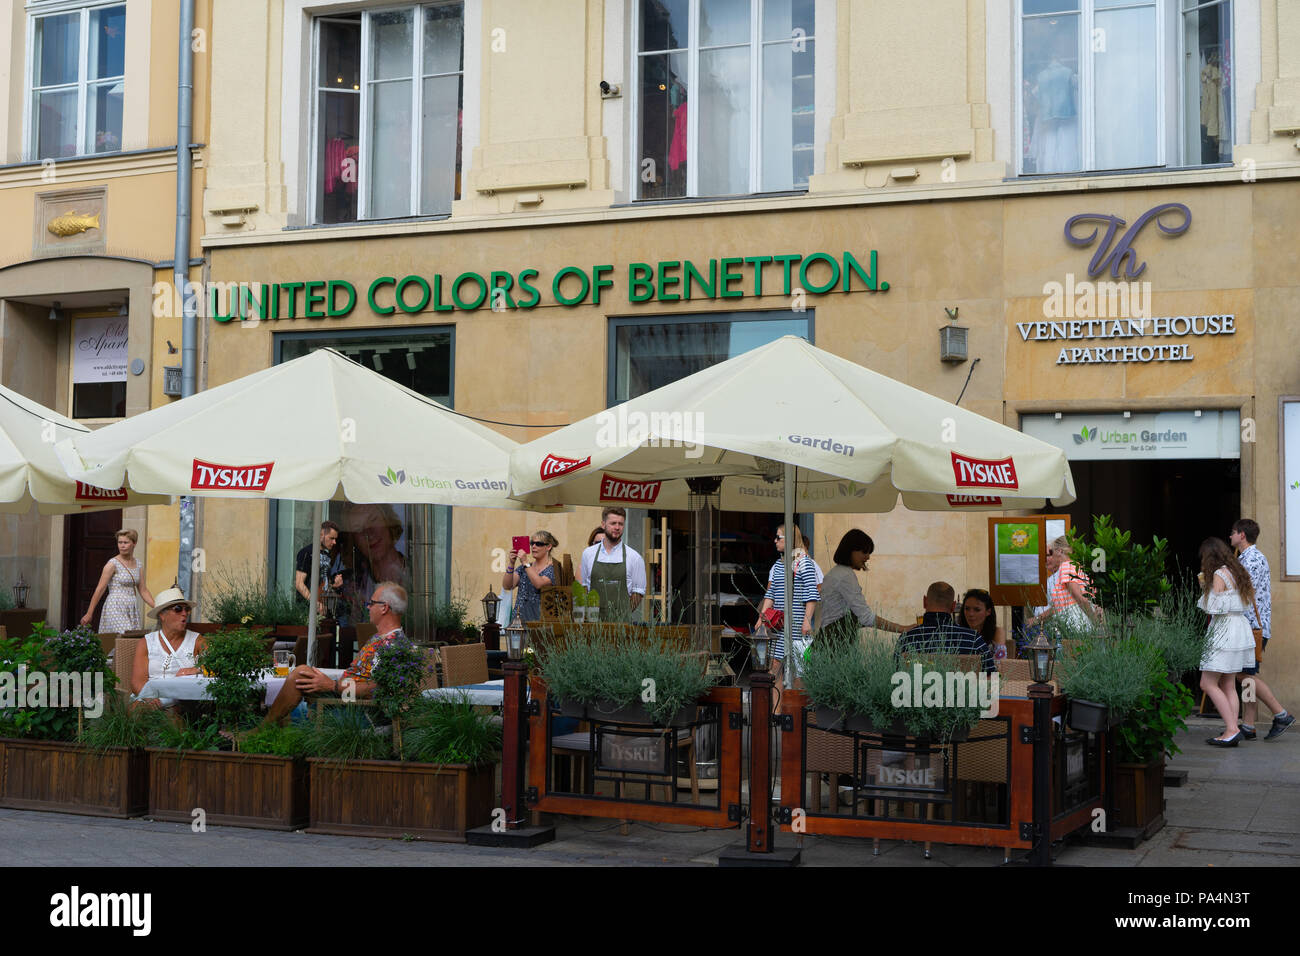 United Colors of Benetton clothing store,Krakow, Poland, Europe. - Stock Image